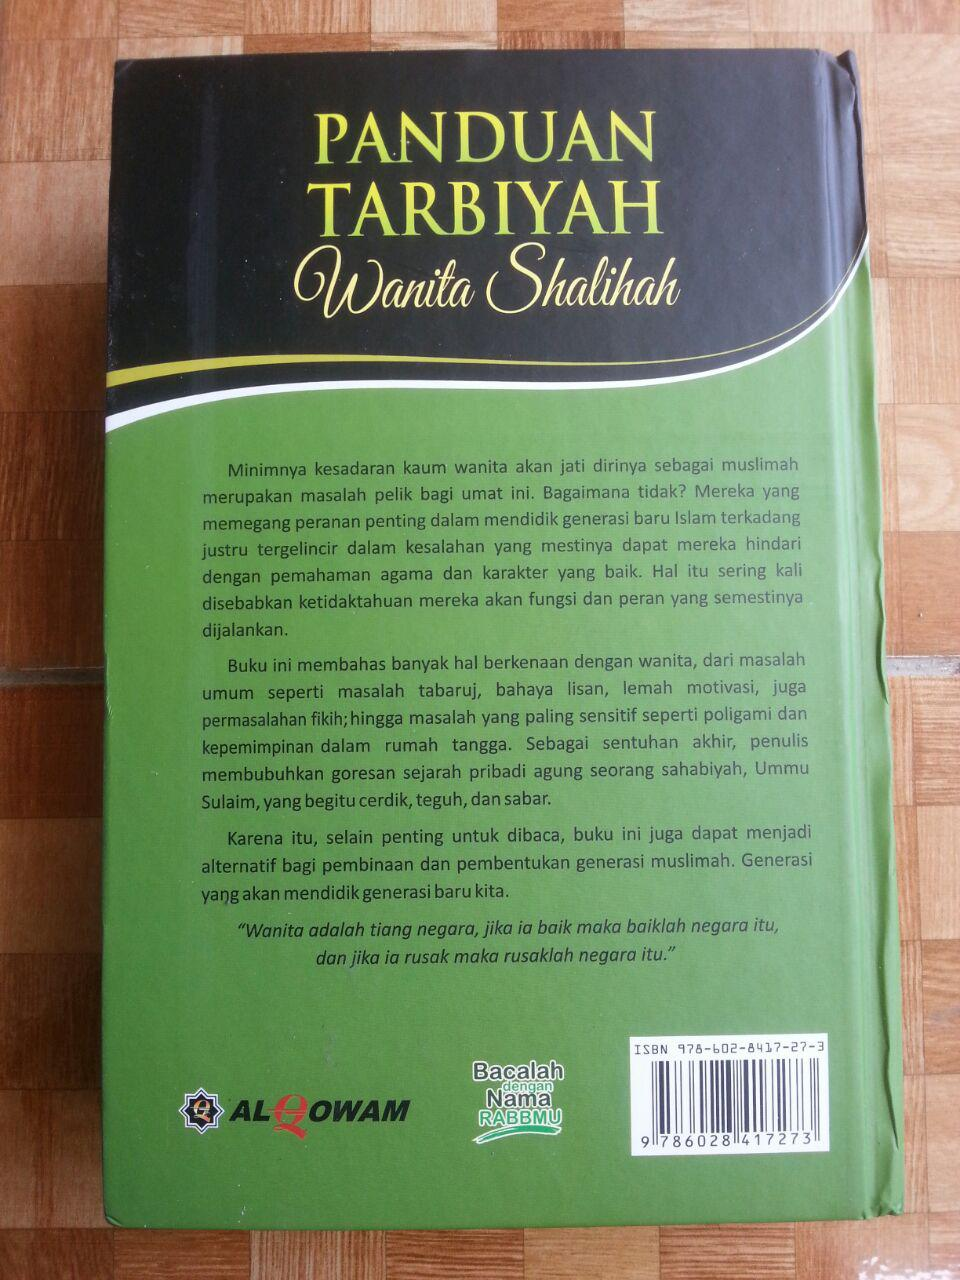 Buku Panduan Tarbiyah Wanita Shalihah cover